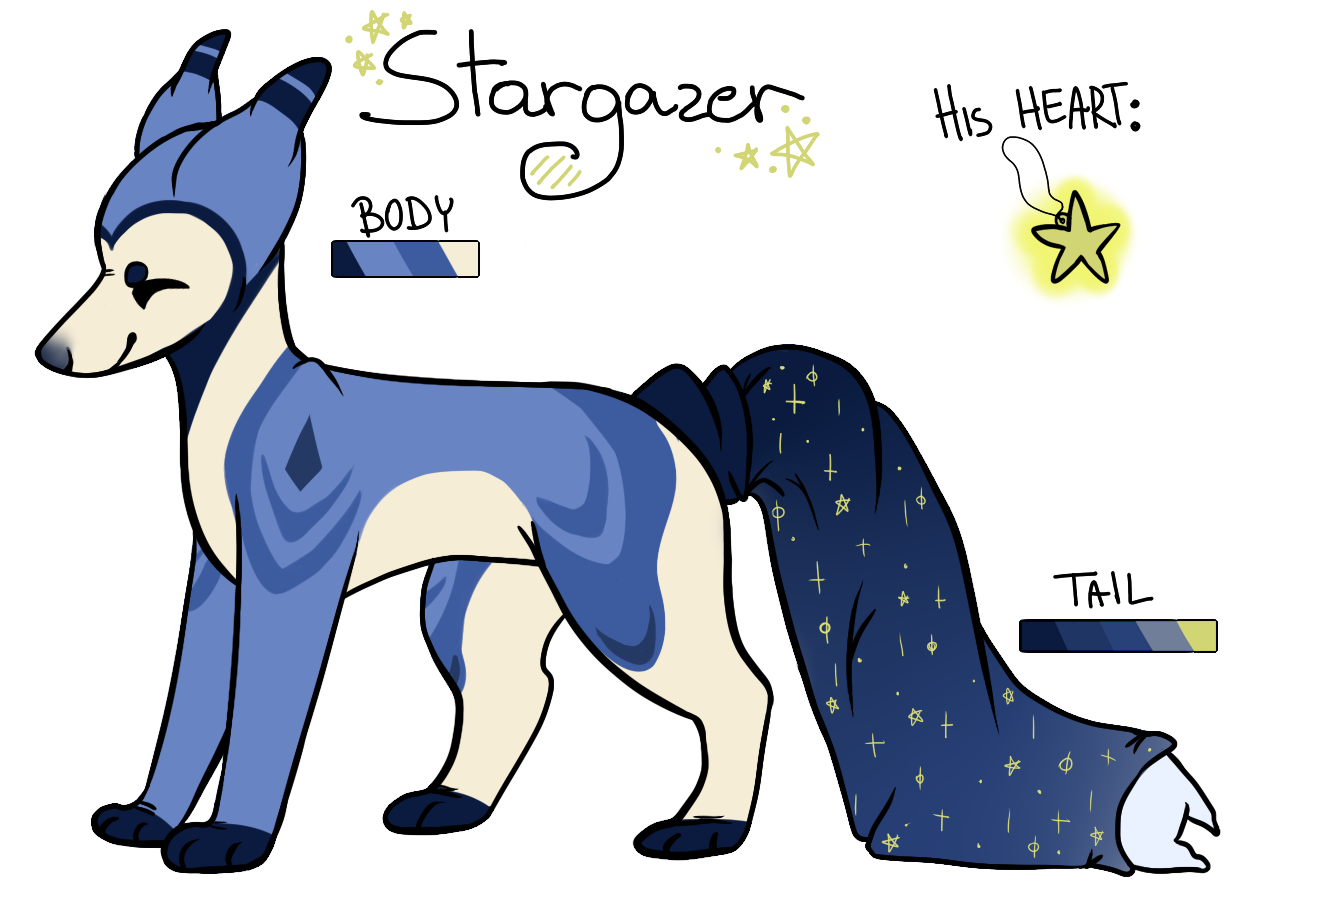 [MYO Pillowing] Stargazer by fl0werprince